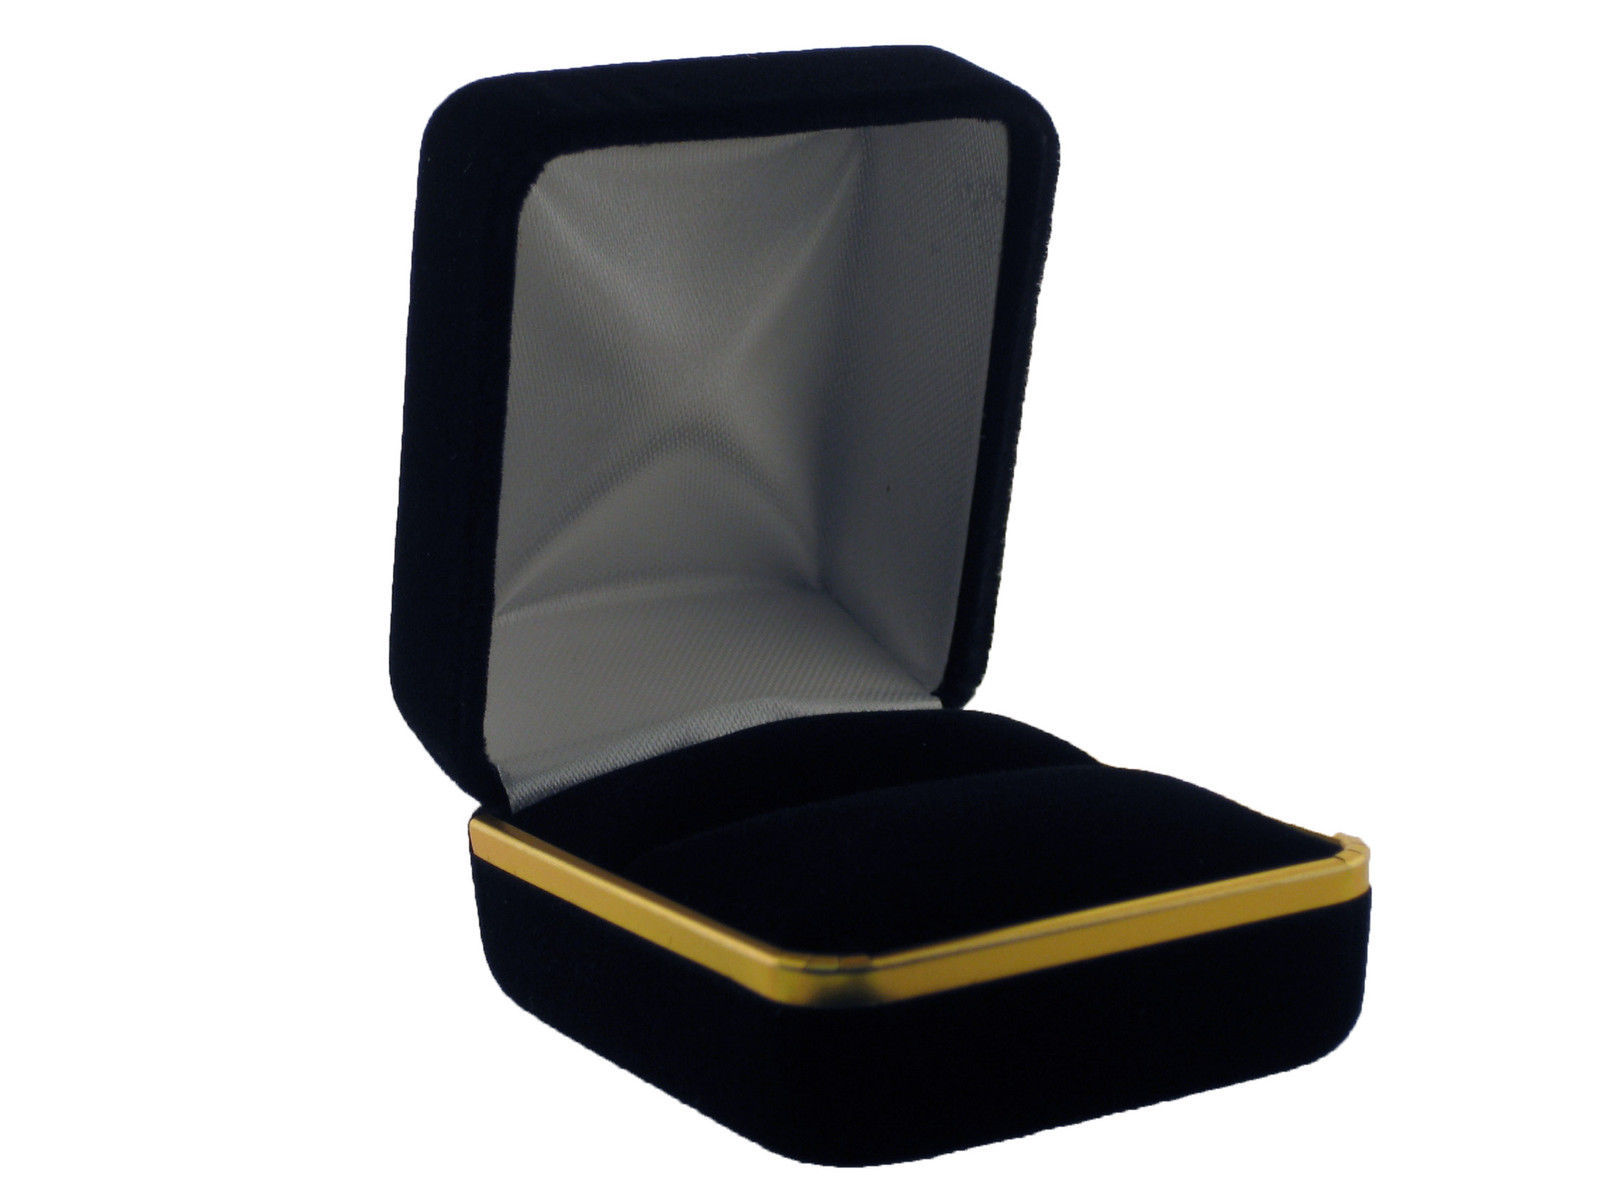 Jewelry Gift Box Beutifull Black Velvet For and 50 similar items